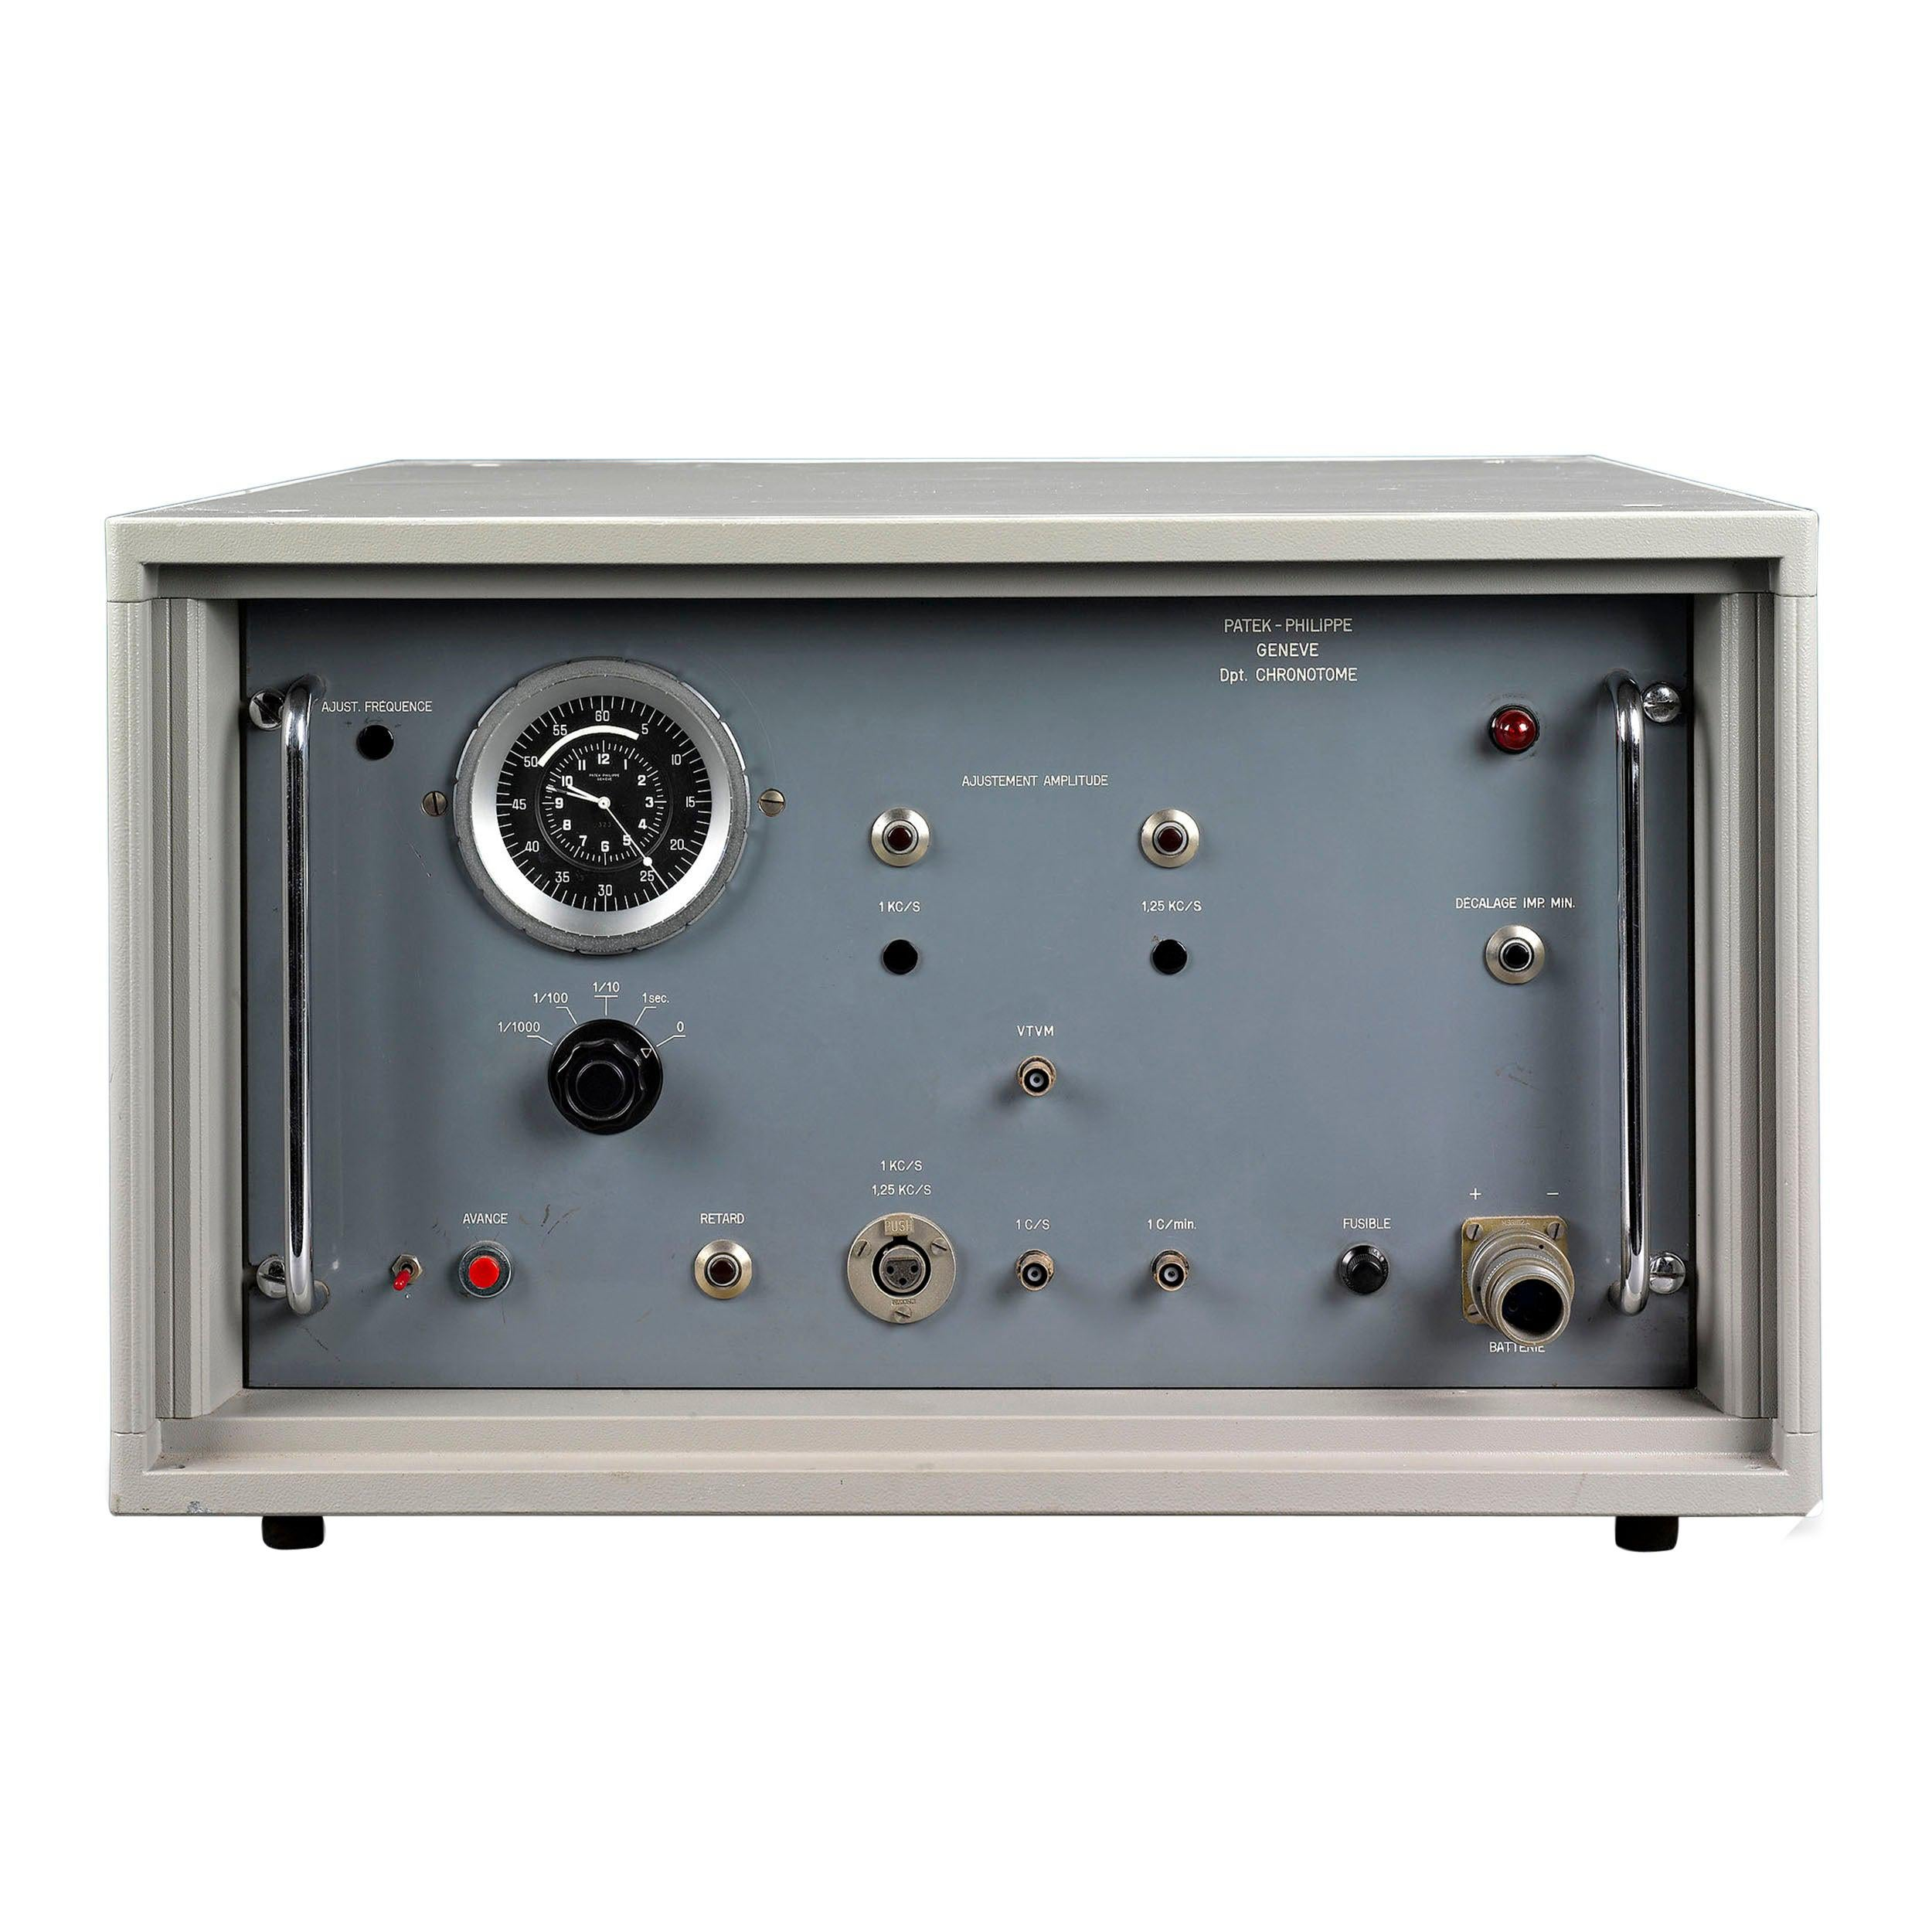 Patek Philippe Chronotome Electronic Clock